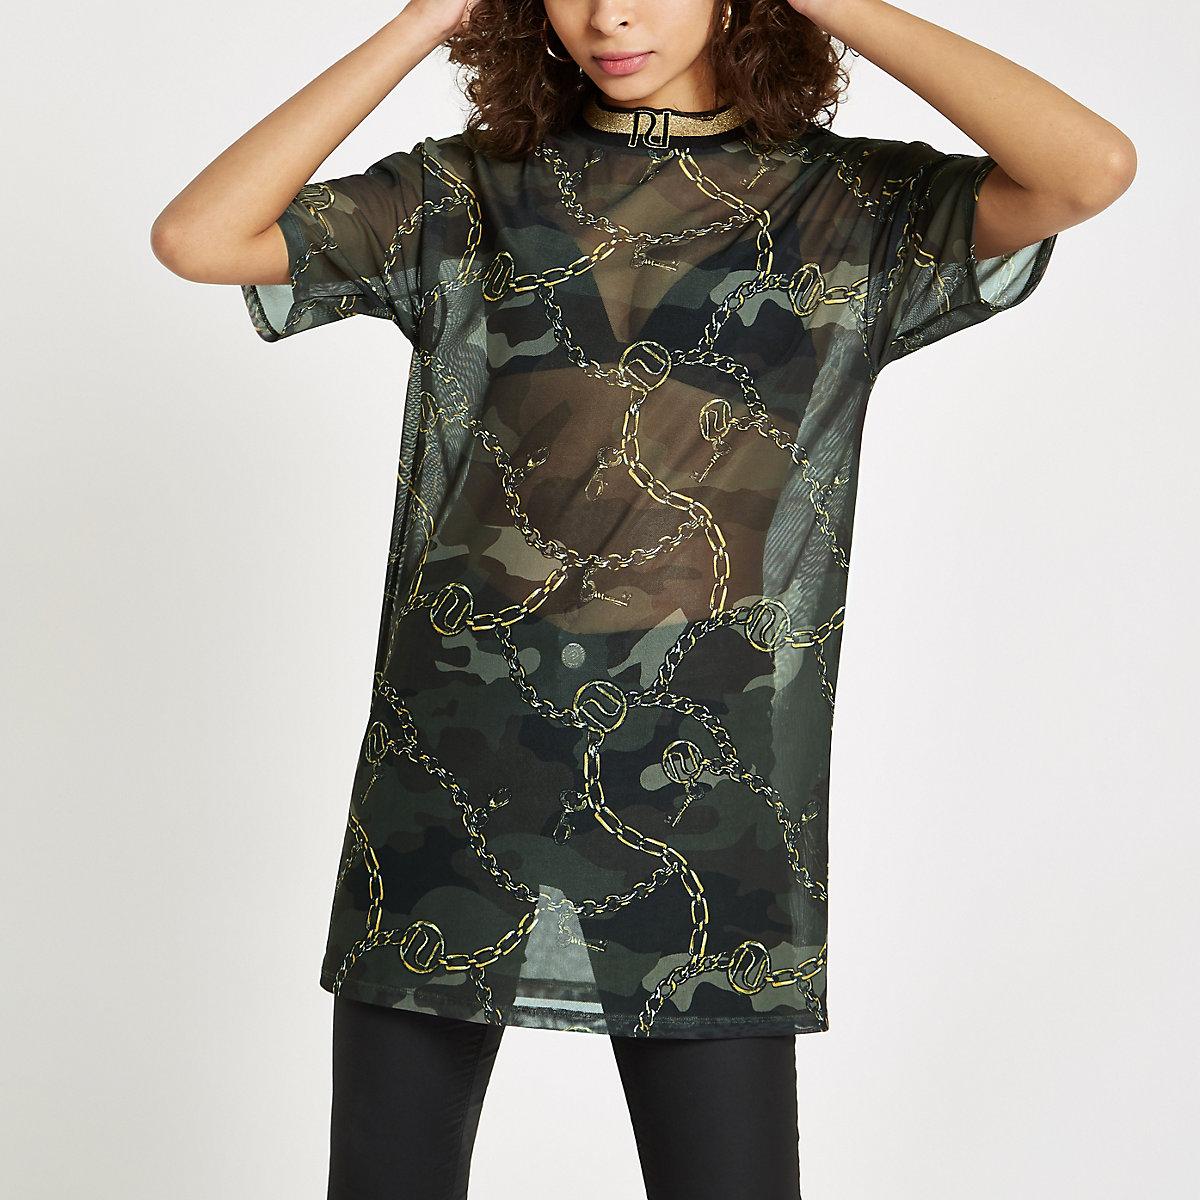 Khaki mesh high neck T-shirt